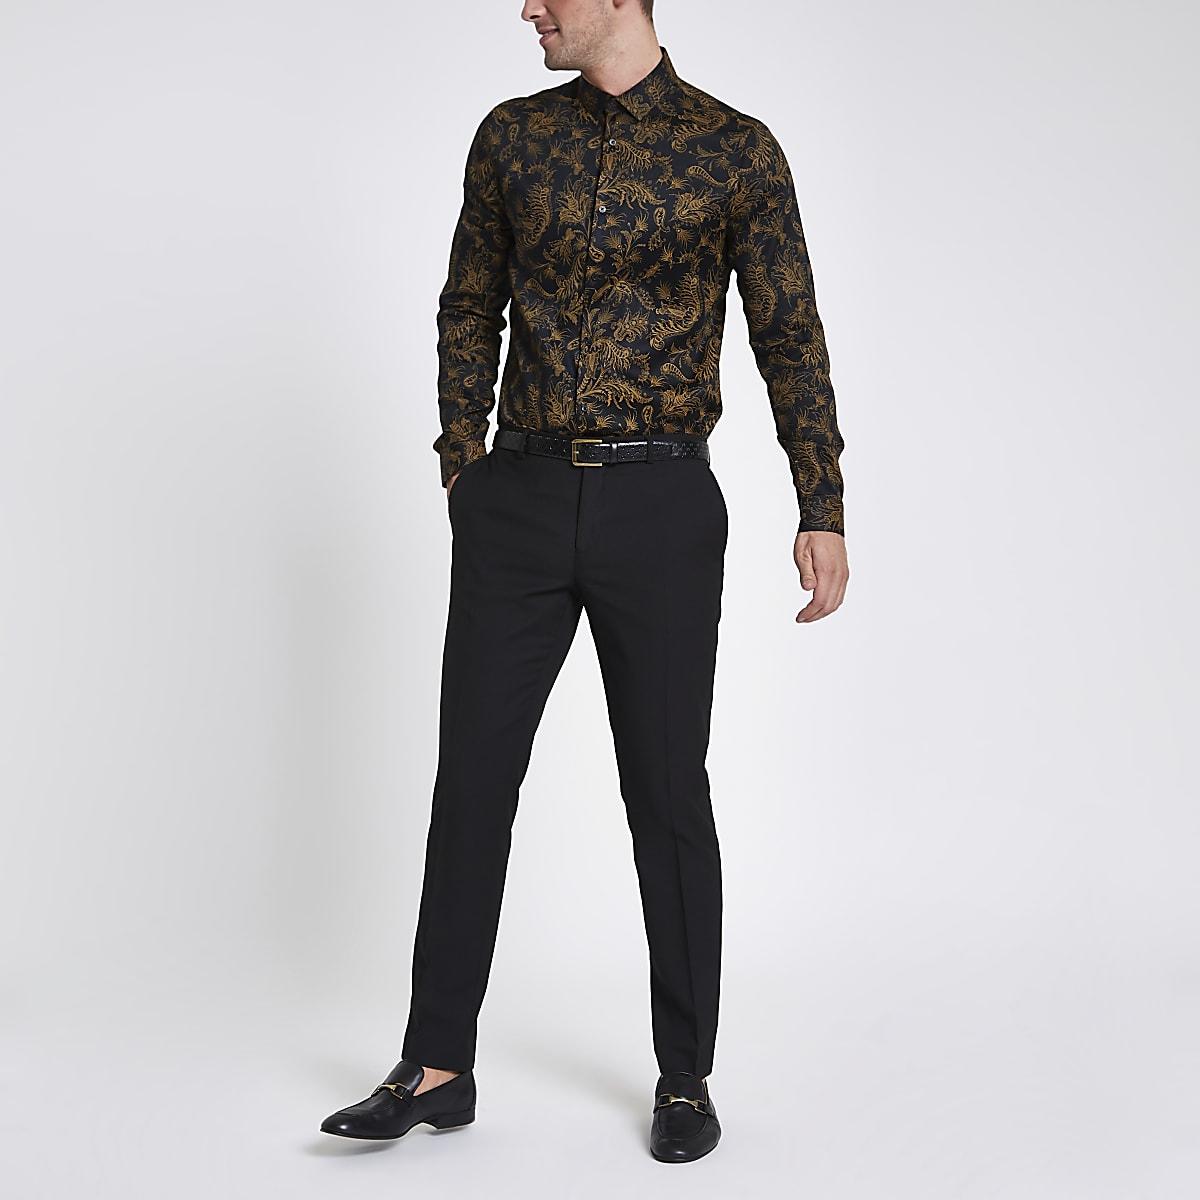 Jack & Jones Premium black tux trousers